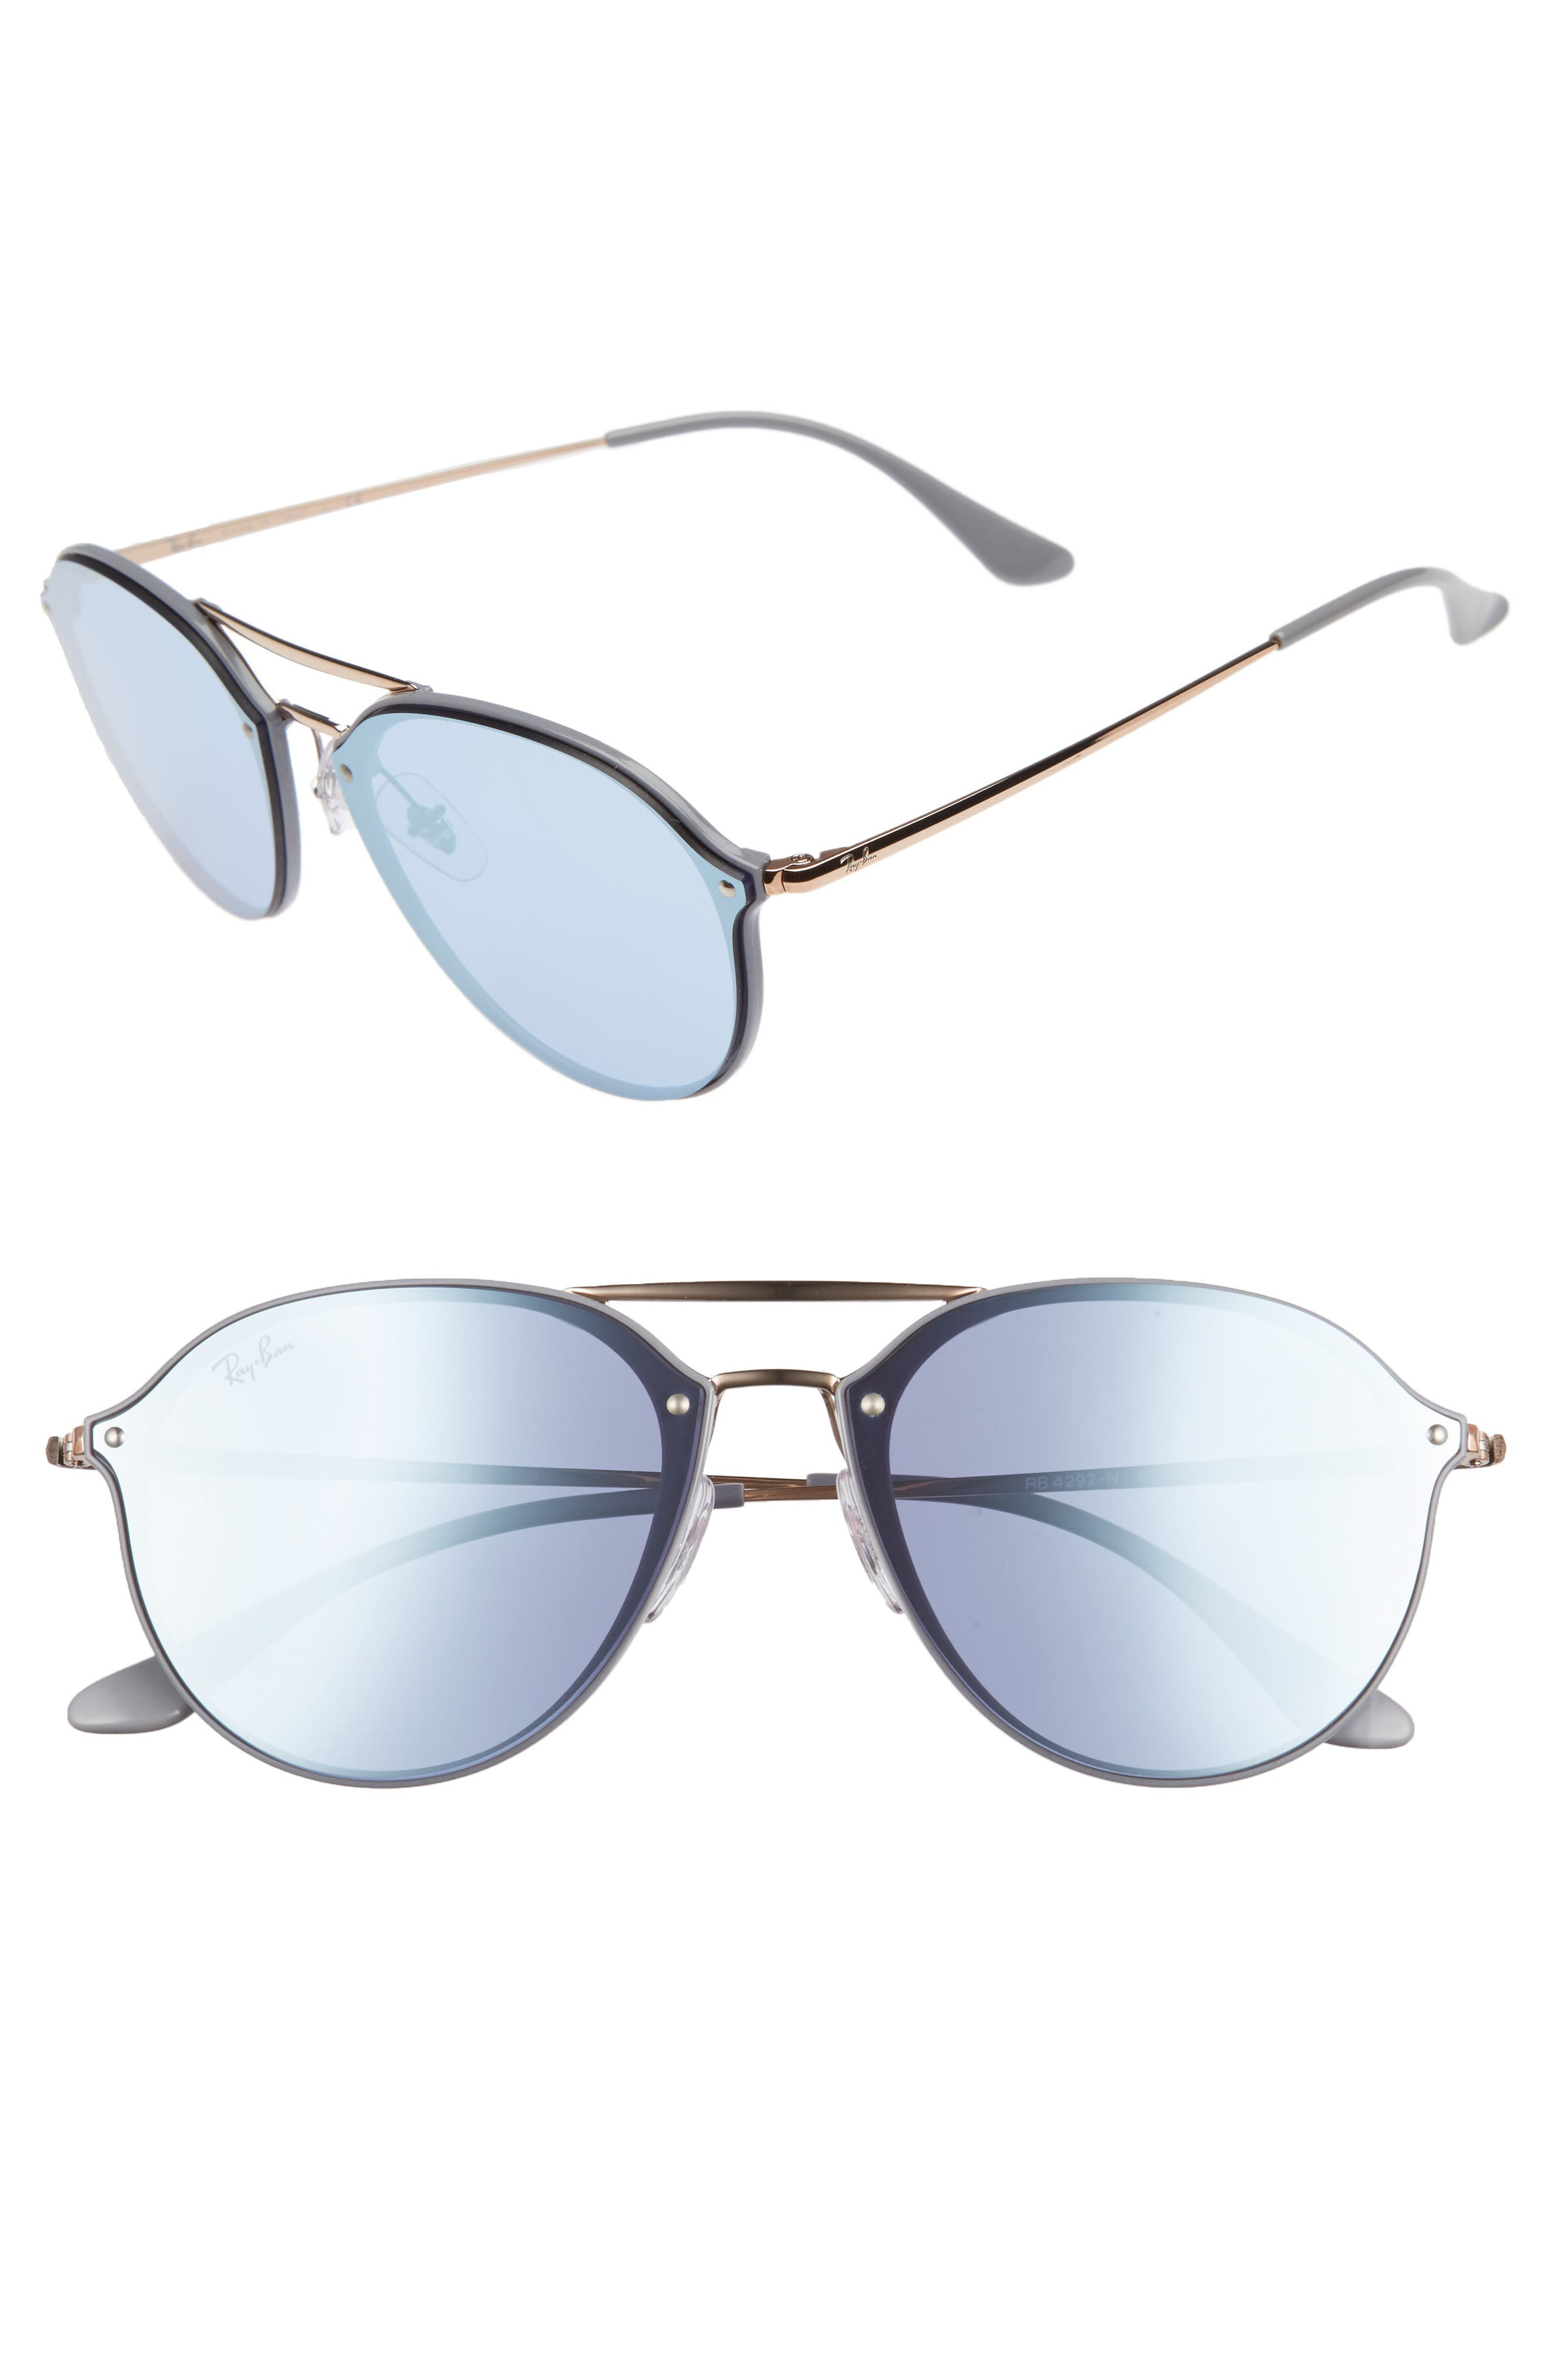 Ray-Ban 62mm Mirrored Lens Aviator Sunglasses